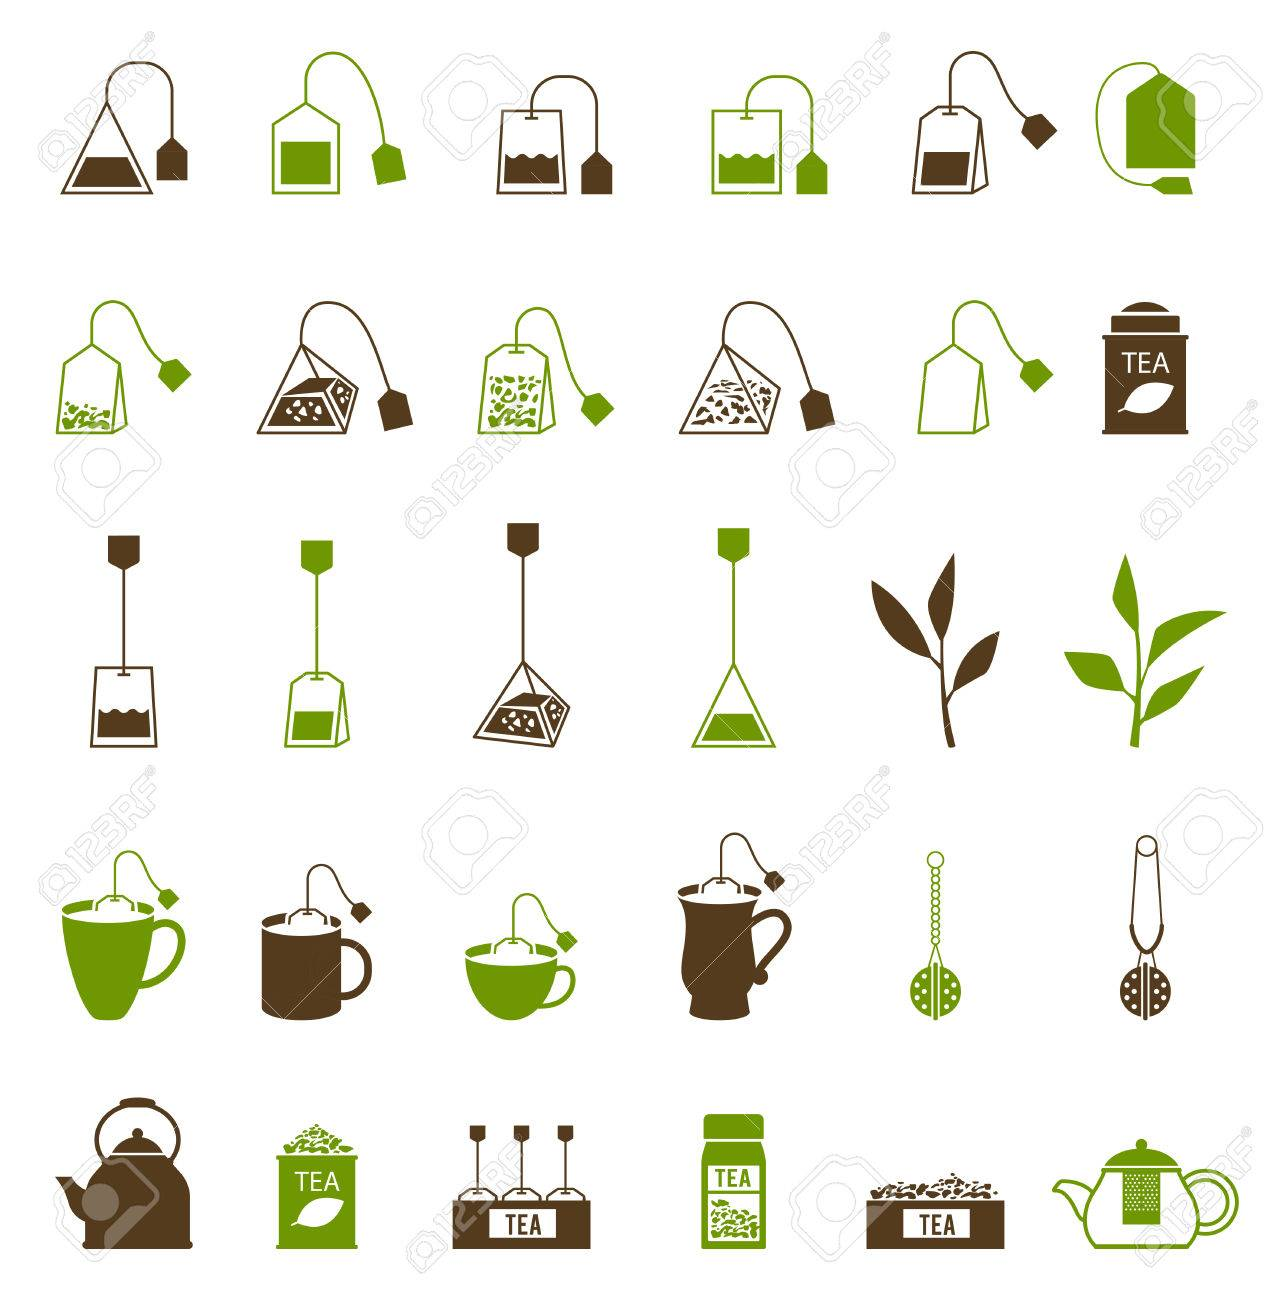 Coffee and Tea cup icon. Teapot and tea bag, tea ceremony. Fresh tea and green leaves. - 62841915